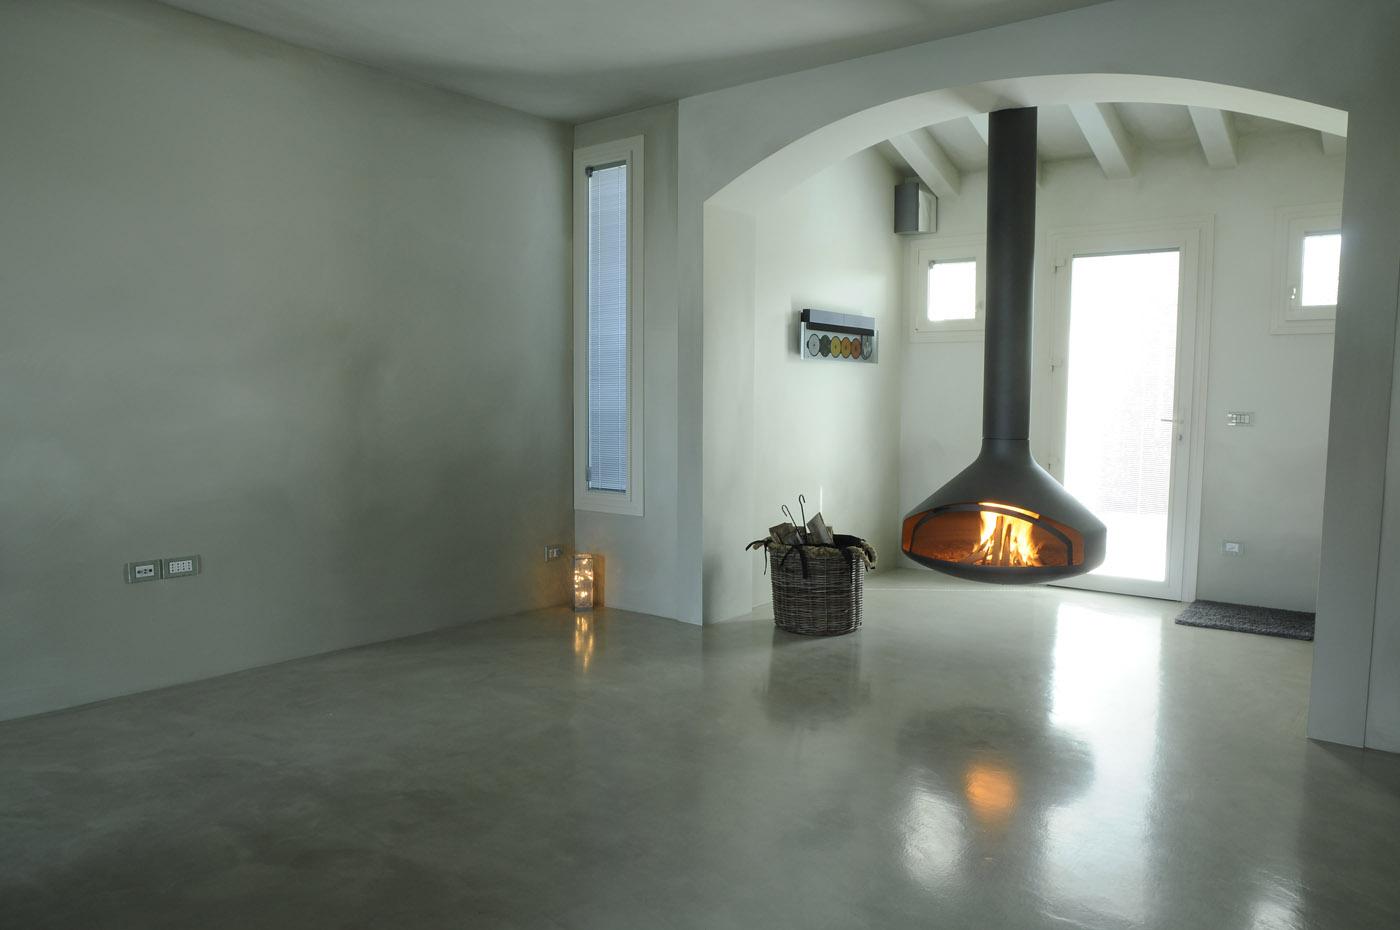 Pavimenti sottili effetto resina parquet pietra leef - Resina per mobili ...